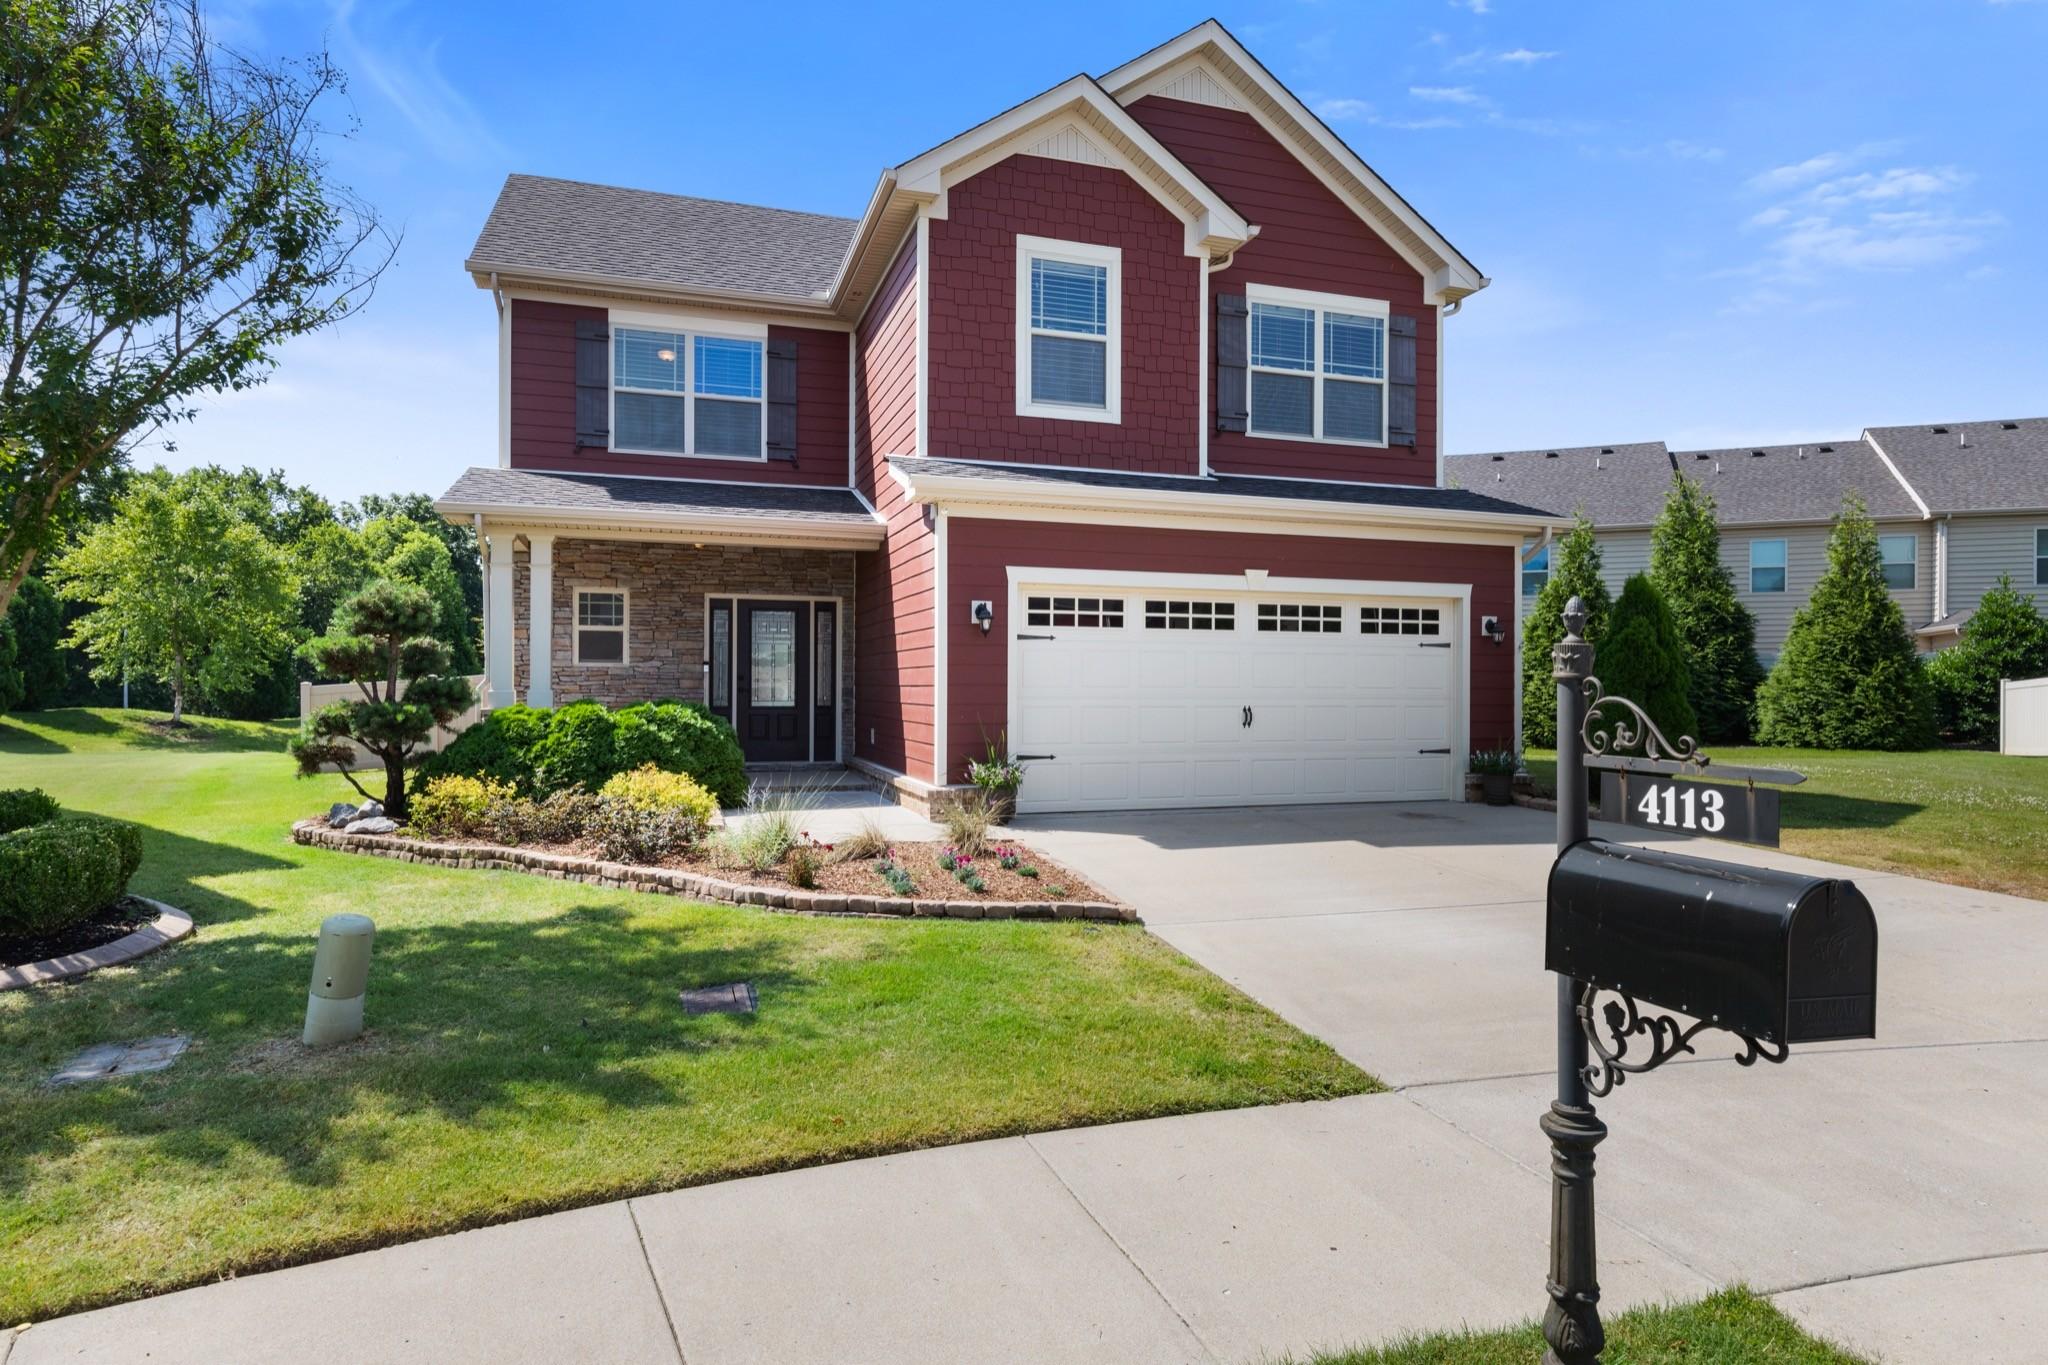 4113 Maximillion Cir Property Photo - Murfreesboro, TN real estate listing